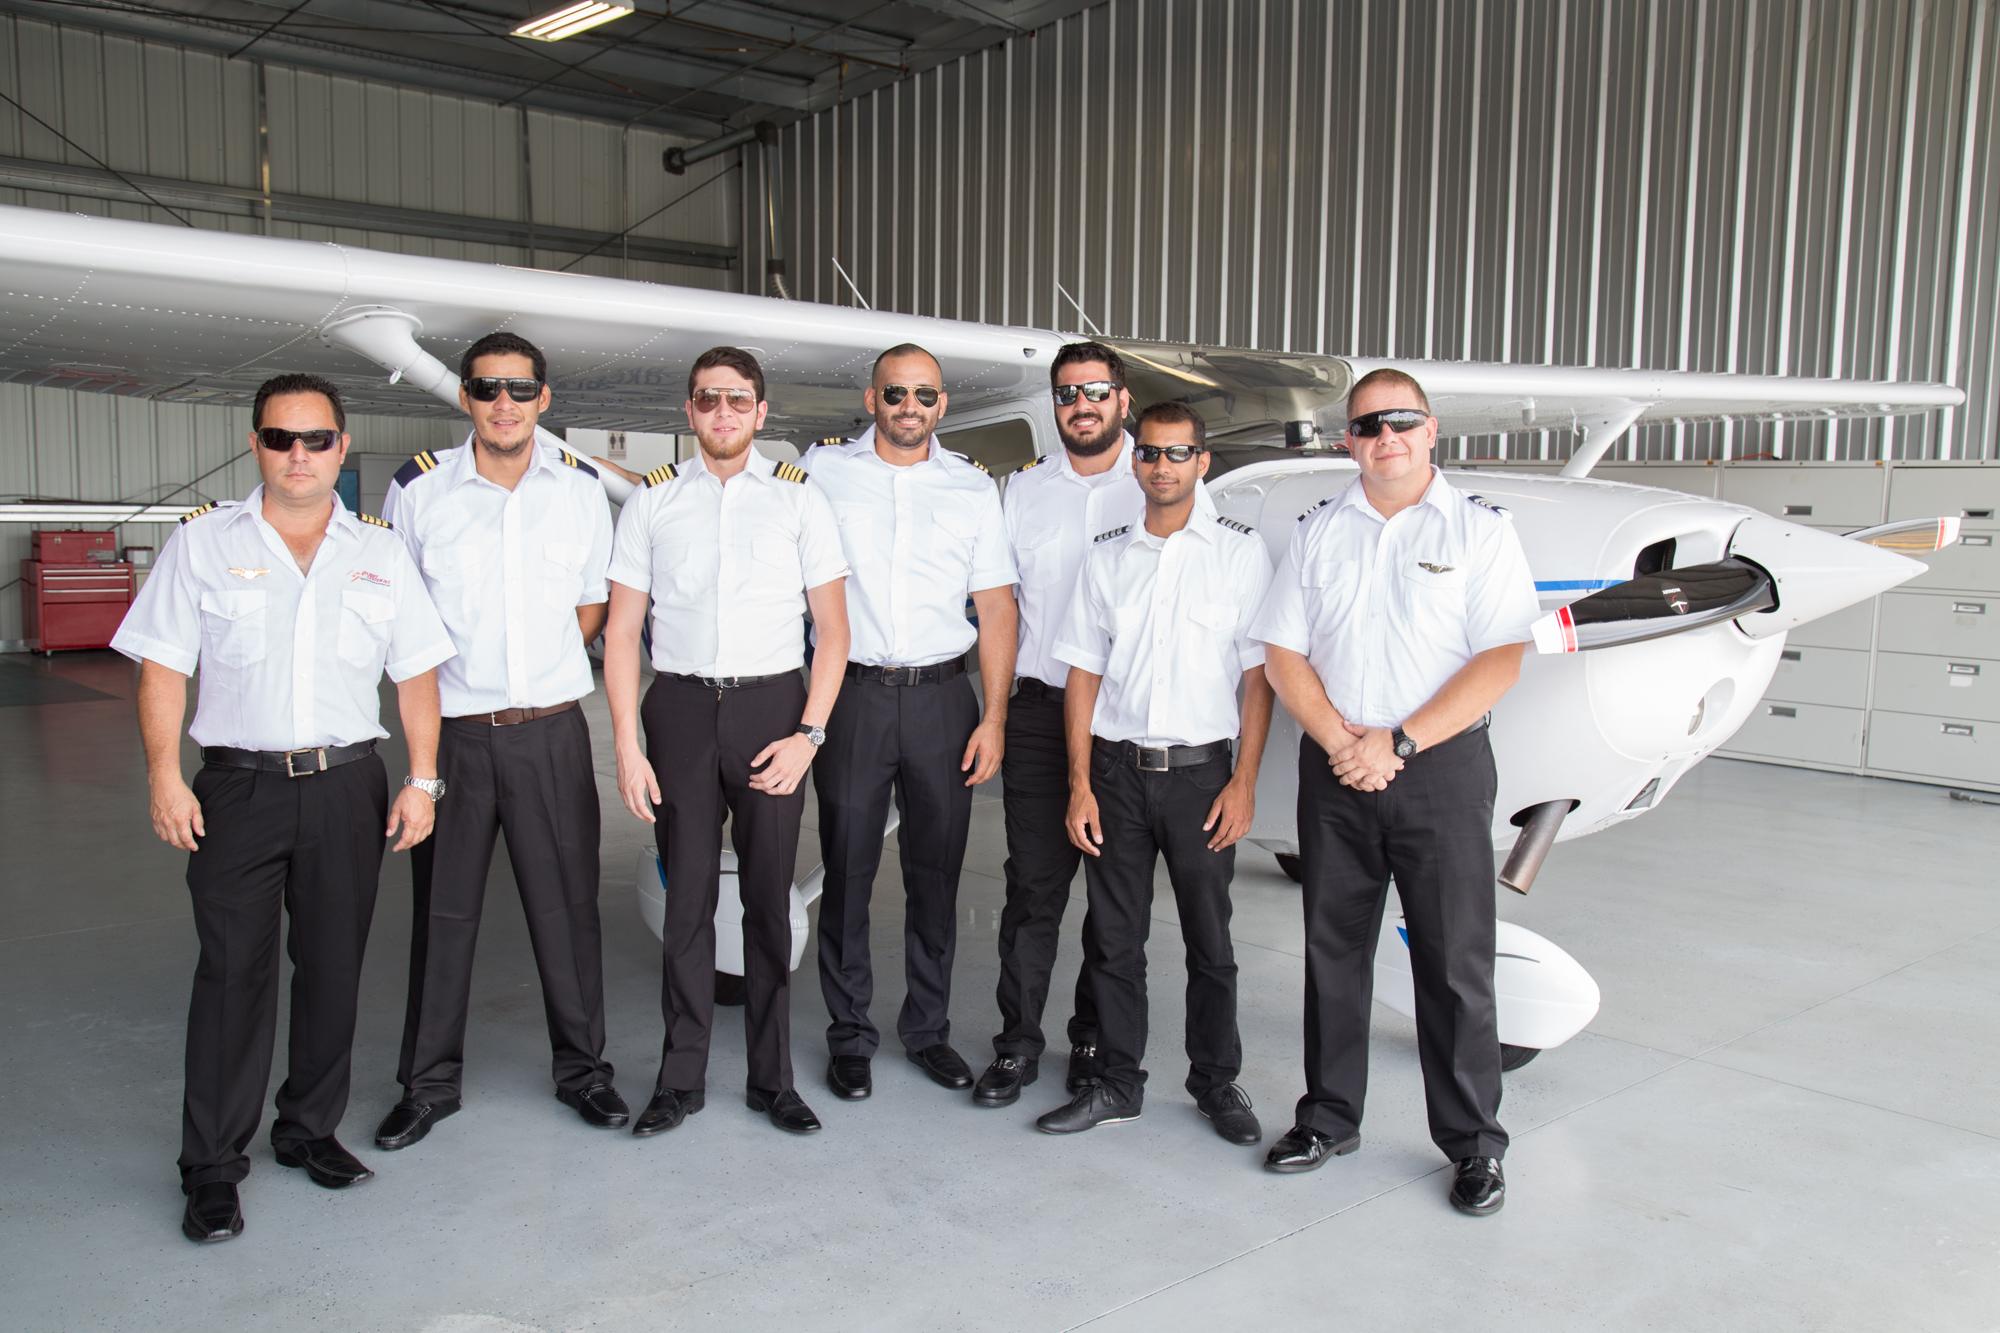 International Student Pilots